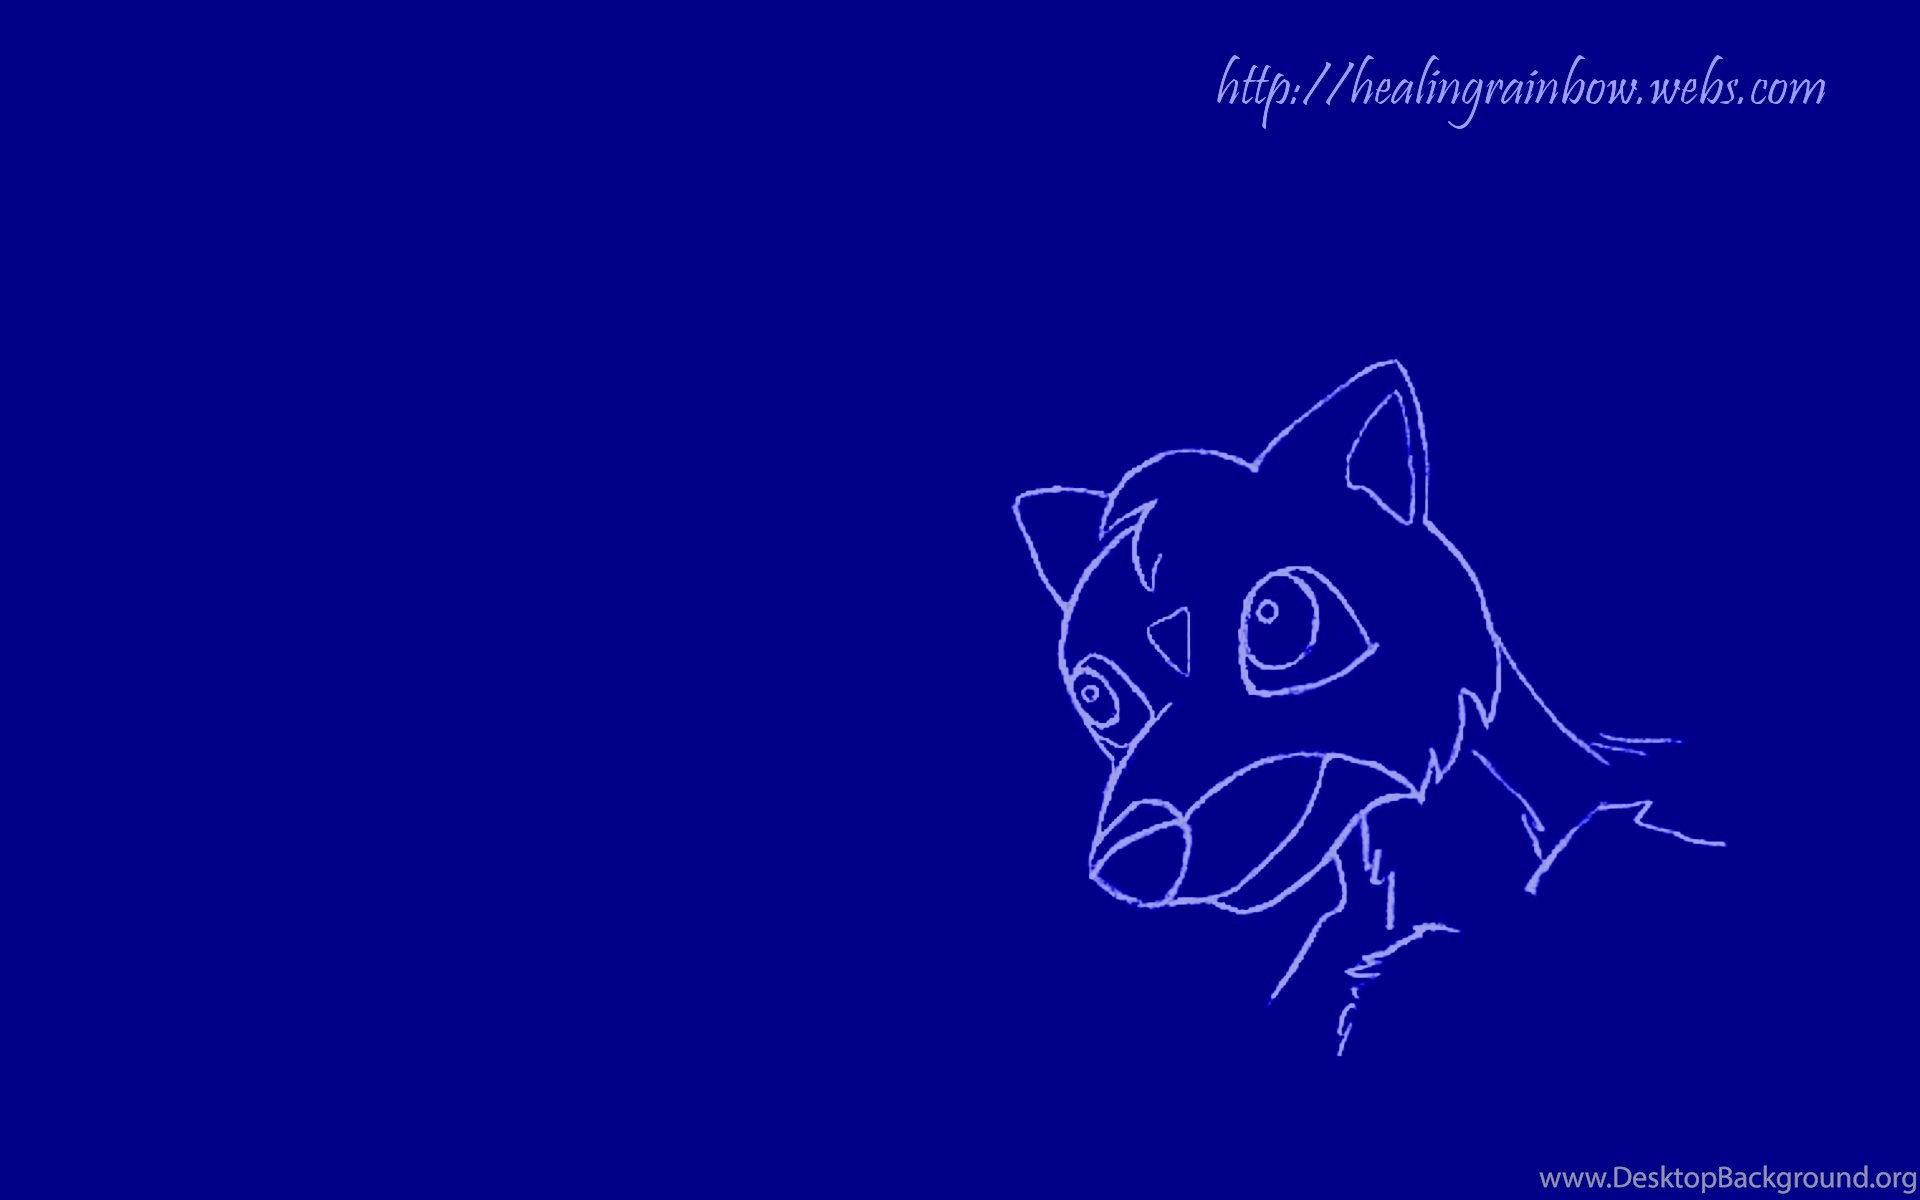 Cute Creature Blue Wallpapers Desktop Background